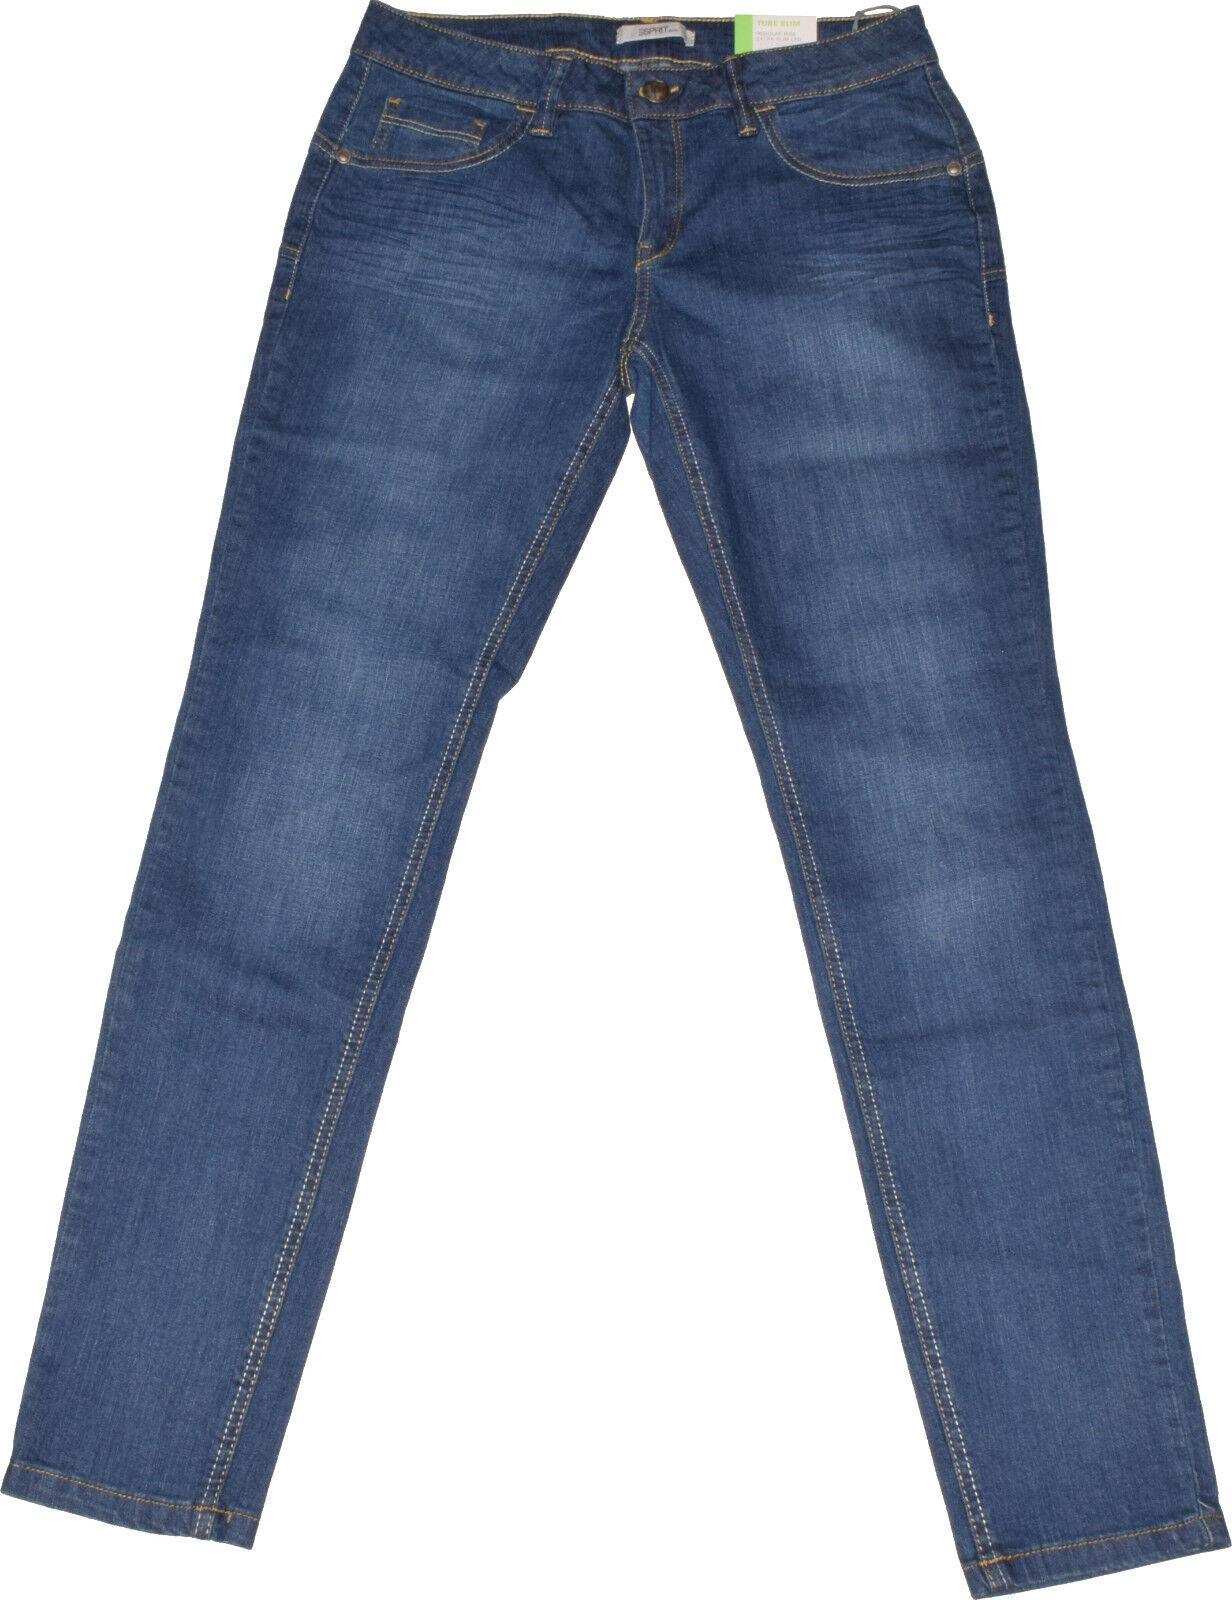 Esprit Skinny Jeans  W31 L32  Stretch  Esxtra Slim Leg  Used Look  NEU